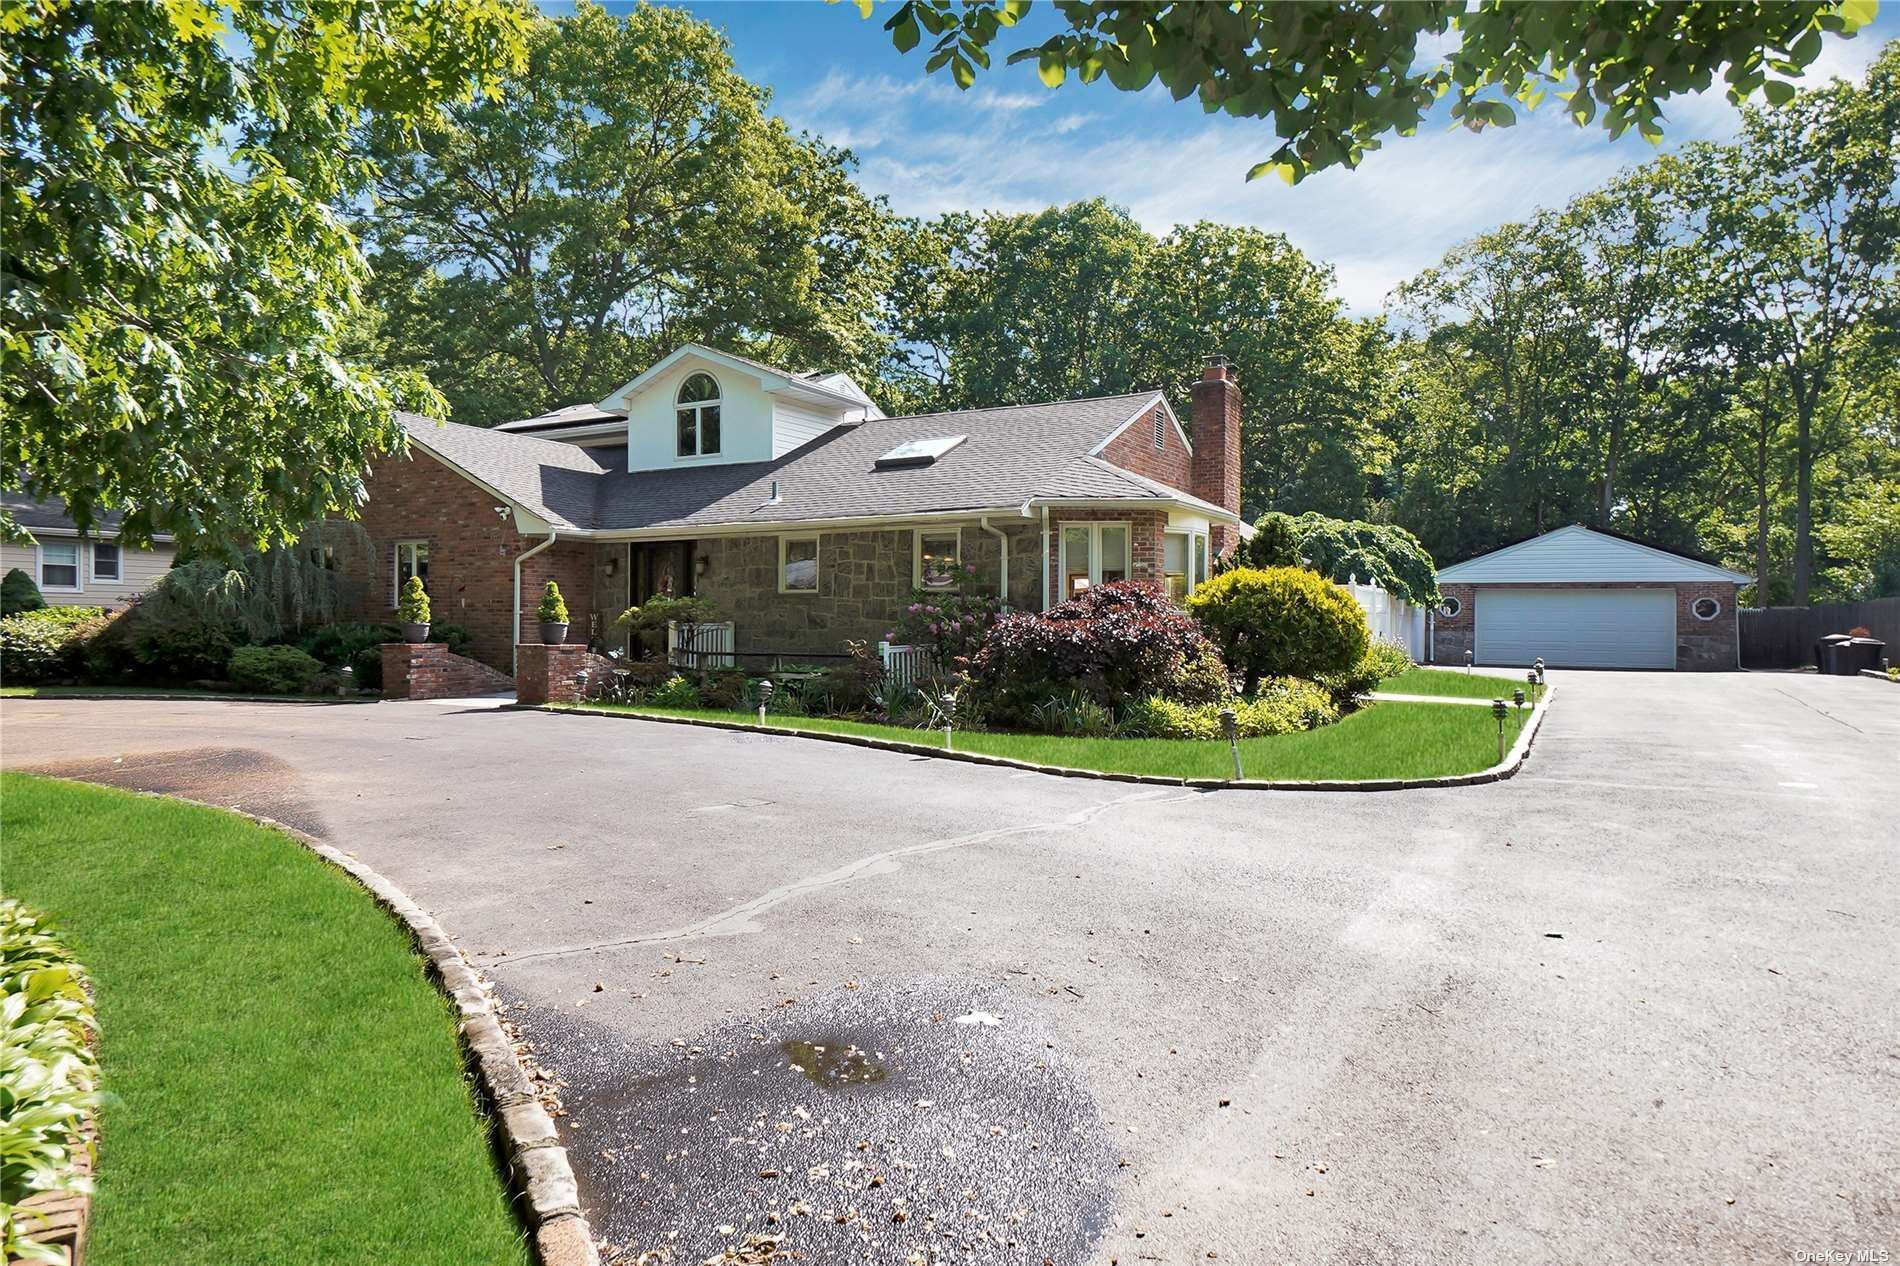 83 Summit Drive, Smithtown, NY 11787 - MLS#: 3320898